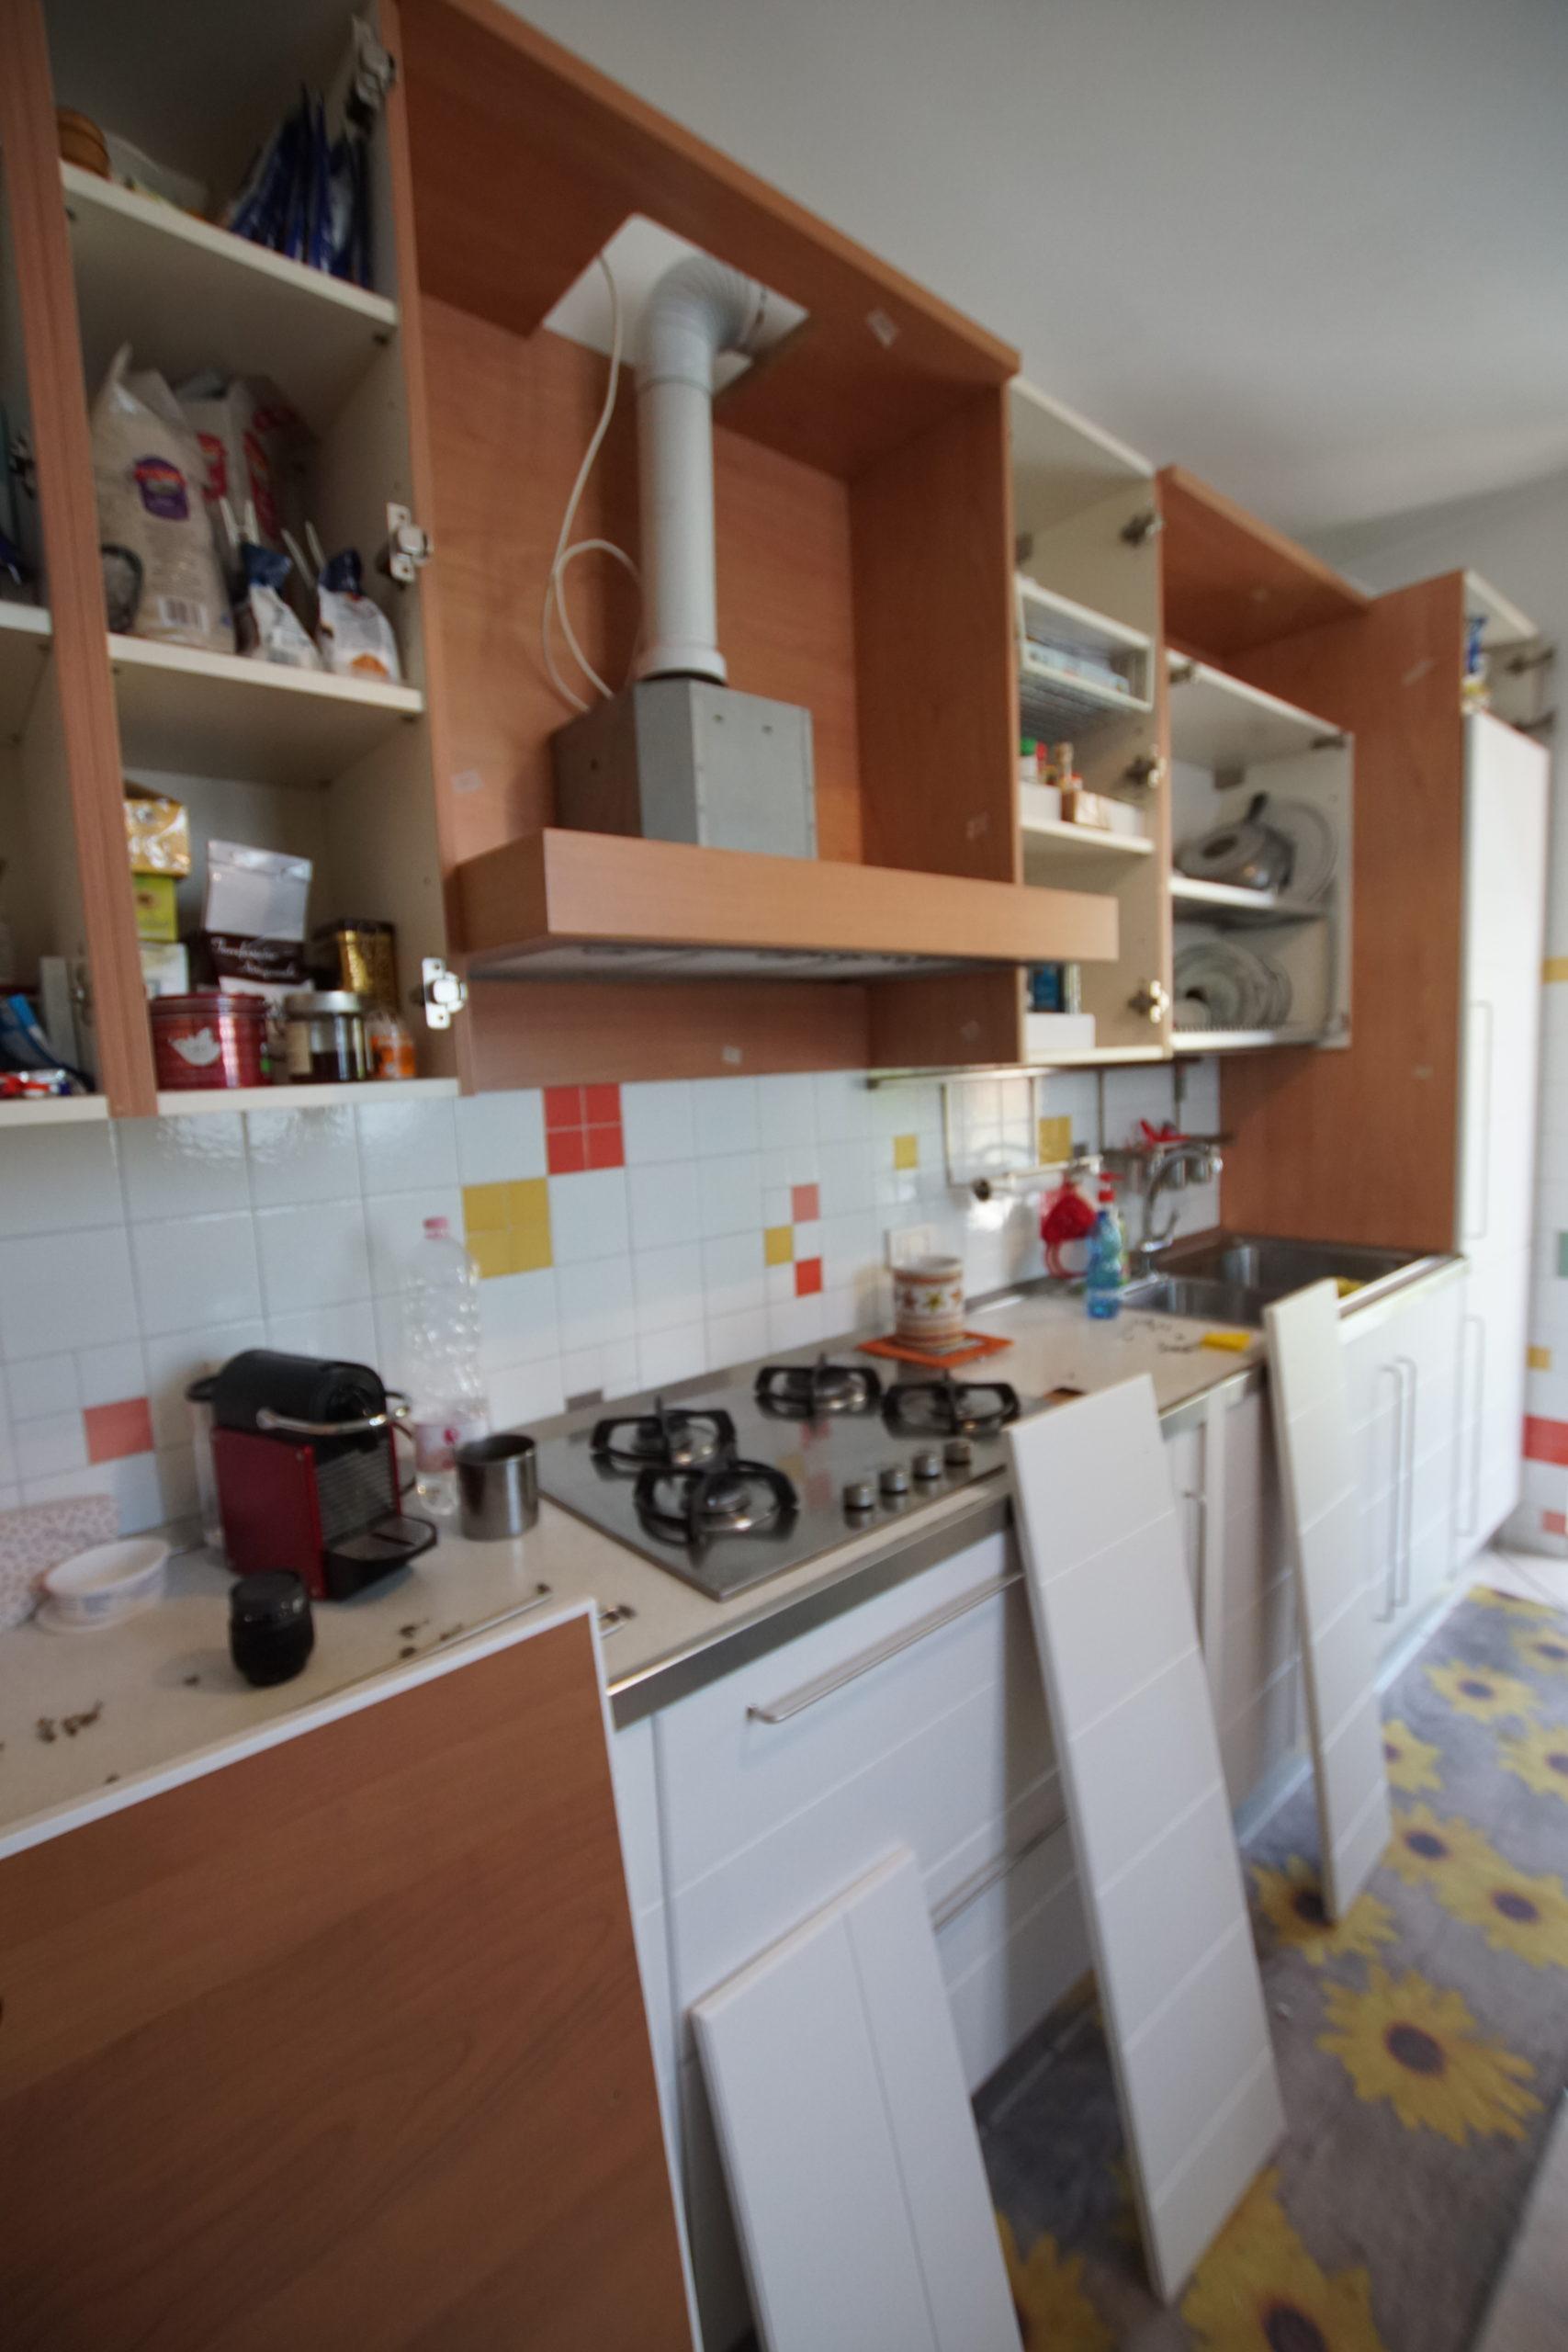 Rinnovo cucina Scavolini – Parabiago